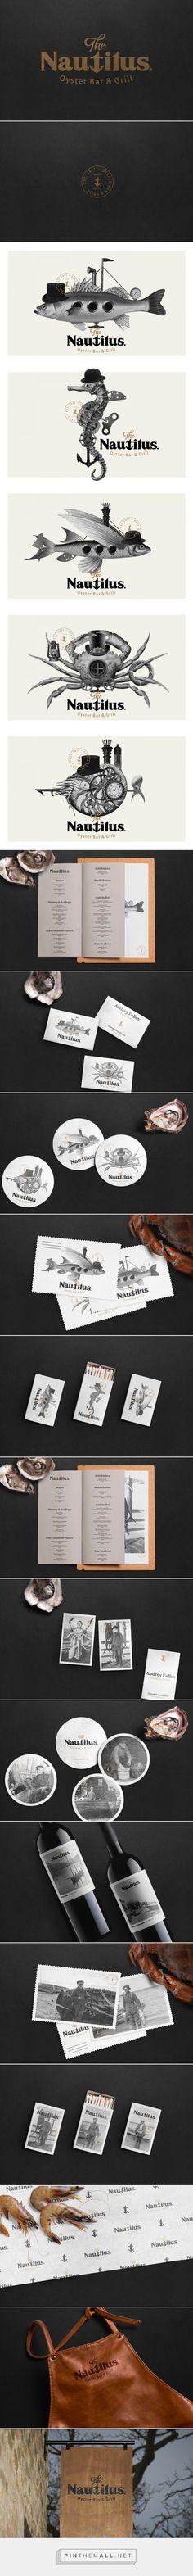 The Nautilus Oyster Bar & Grill Restaurant Branding and Menu Design by Stepan Solodkov | Fivestar Branding Agency – Design and Branding Agency & Curated Inspiration Gallery